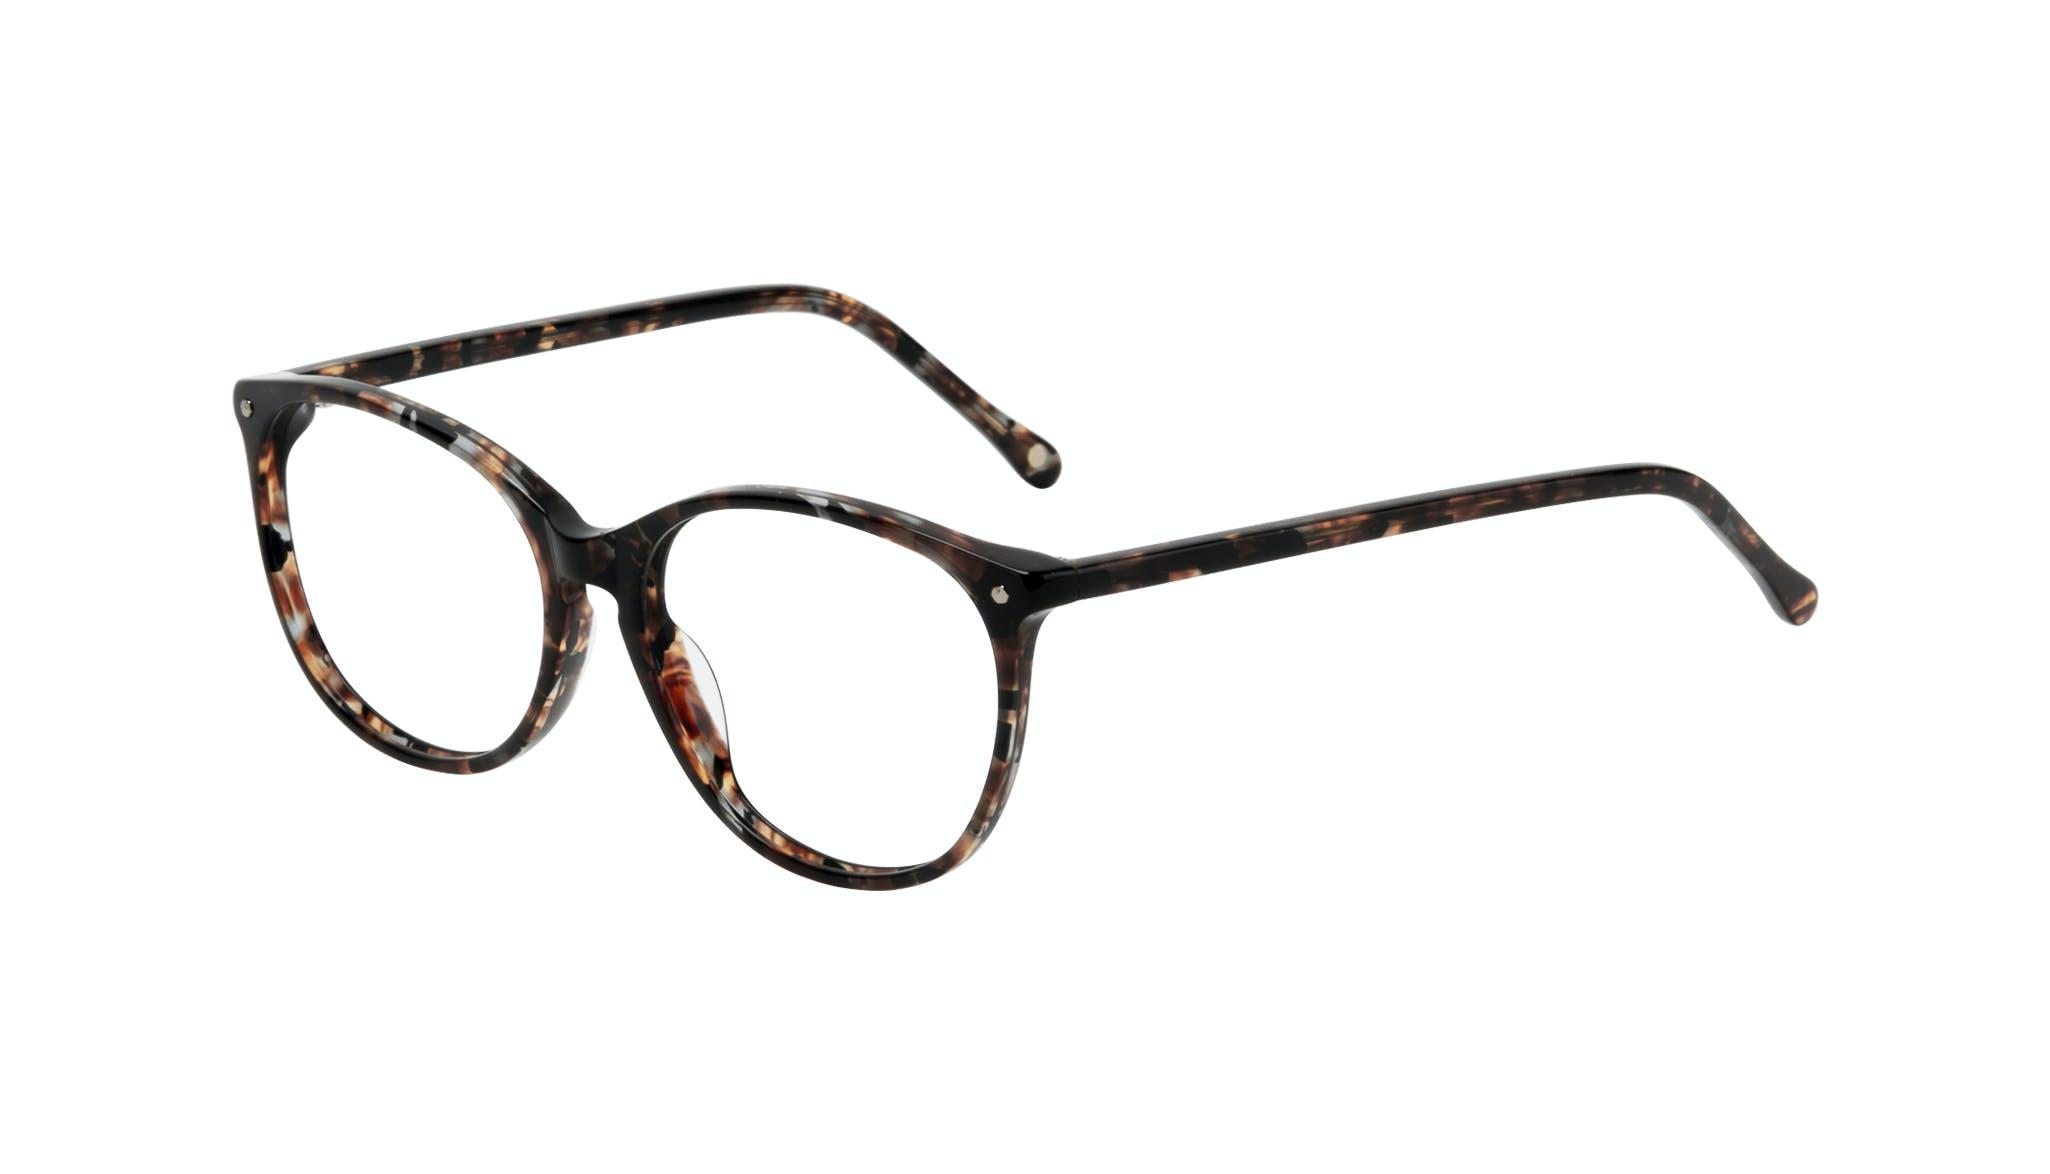 Affordable Fashion Glasses Rectangle Square Round Eyeglasses Women Nadine Sepia Tilt